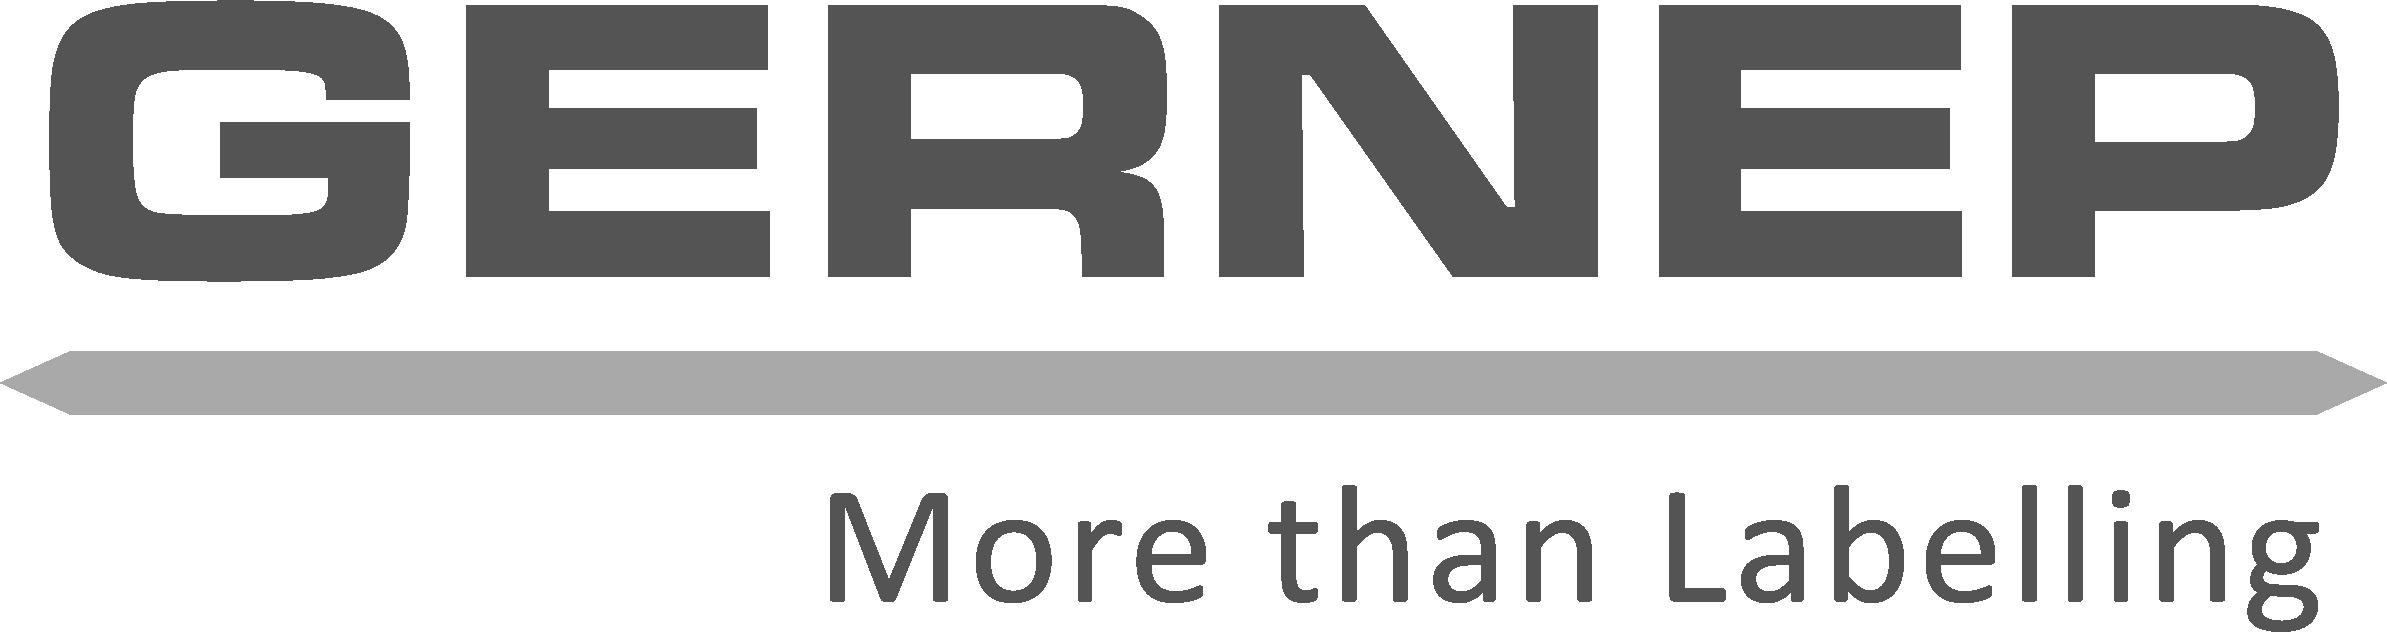 Gernep Logo grau